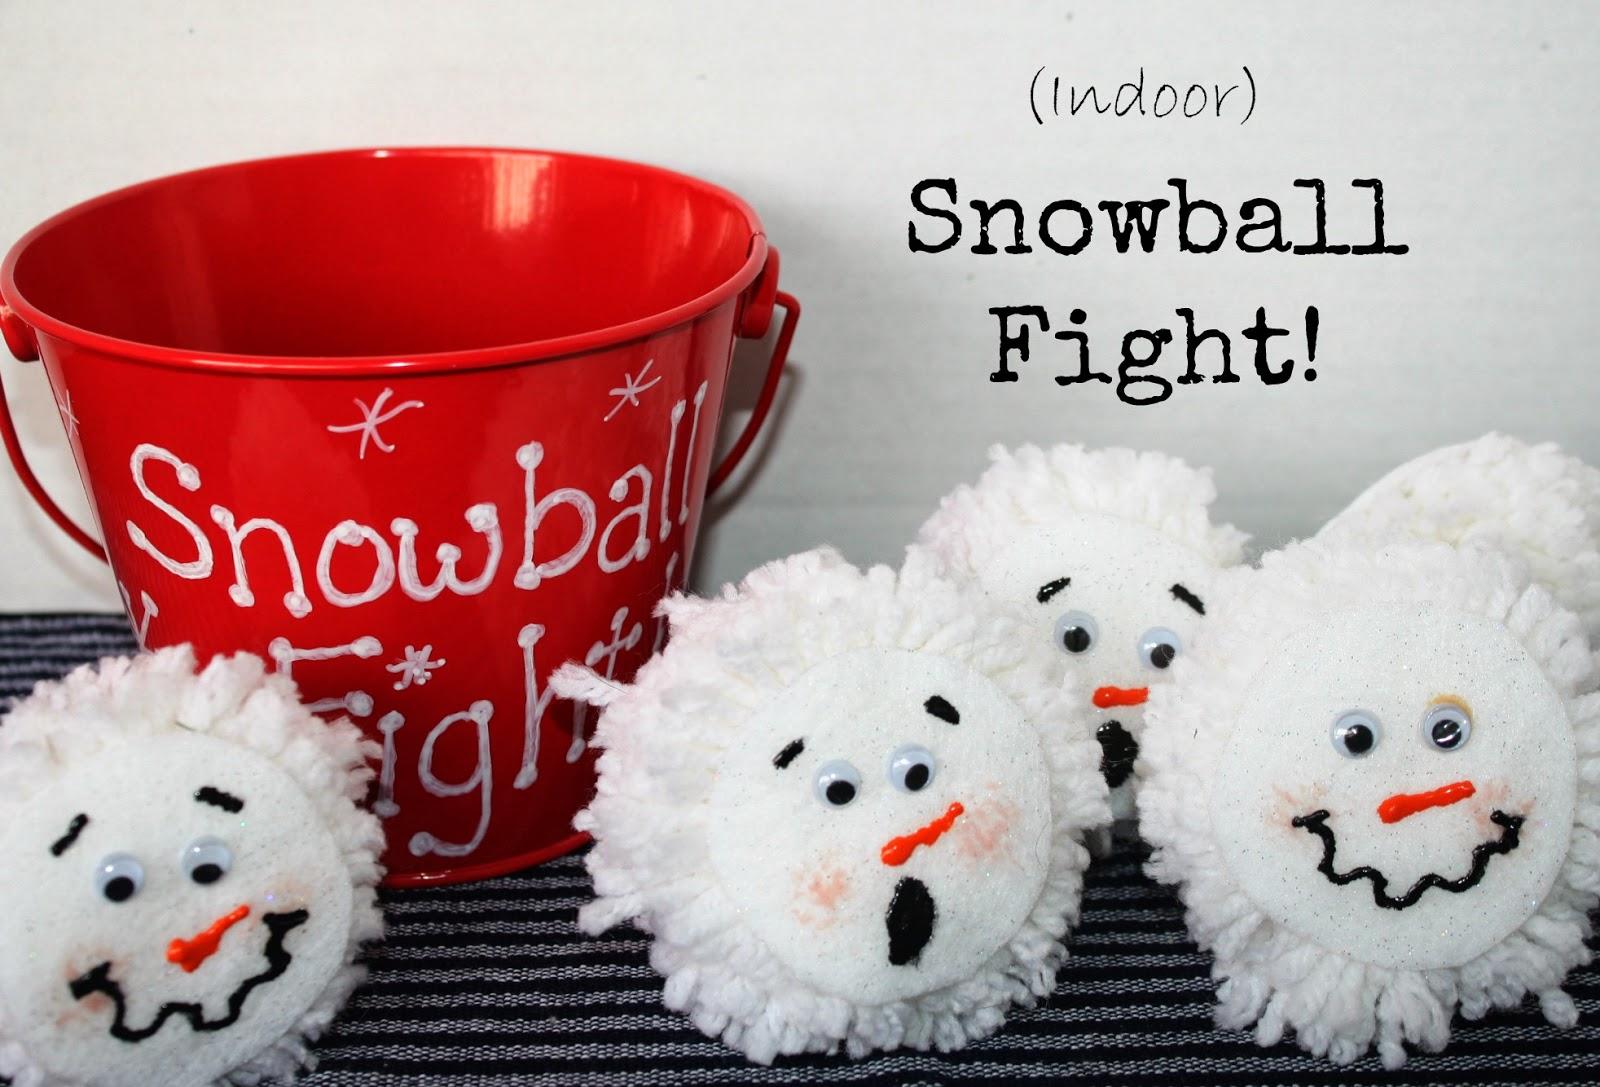 Indoor Snowball Fight!